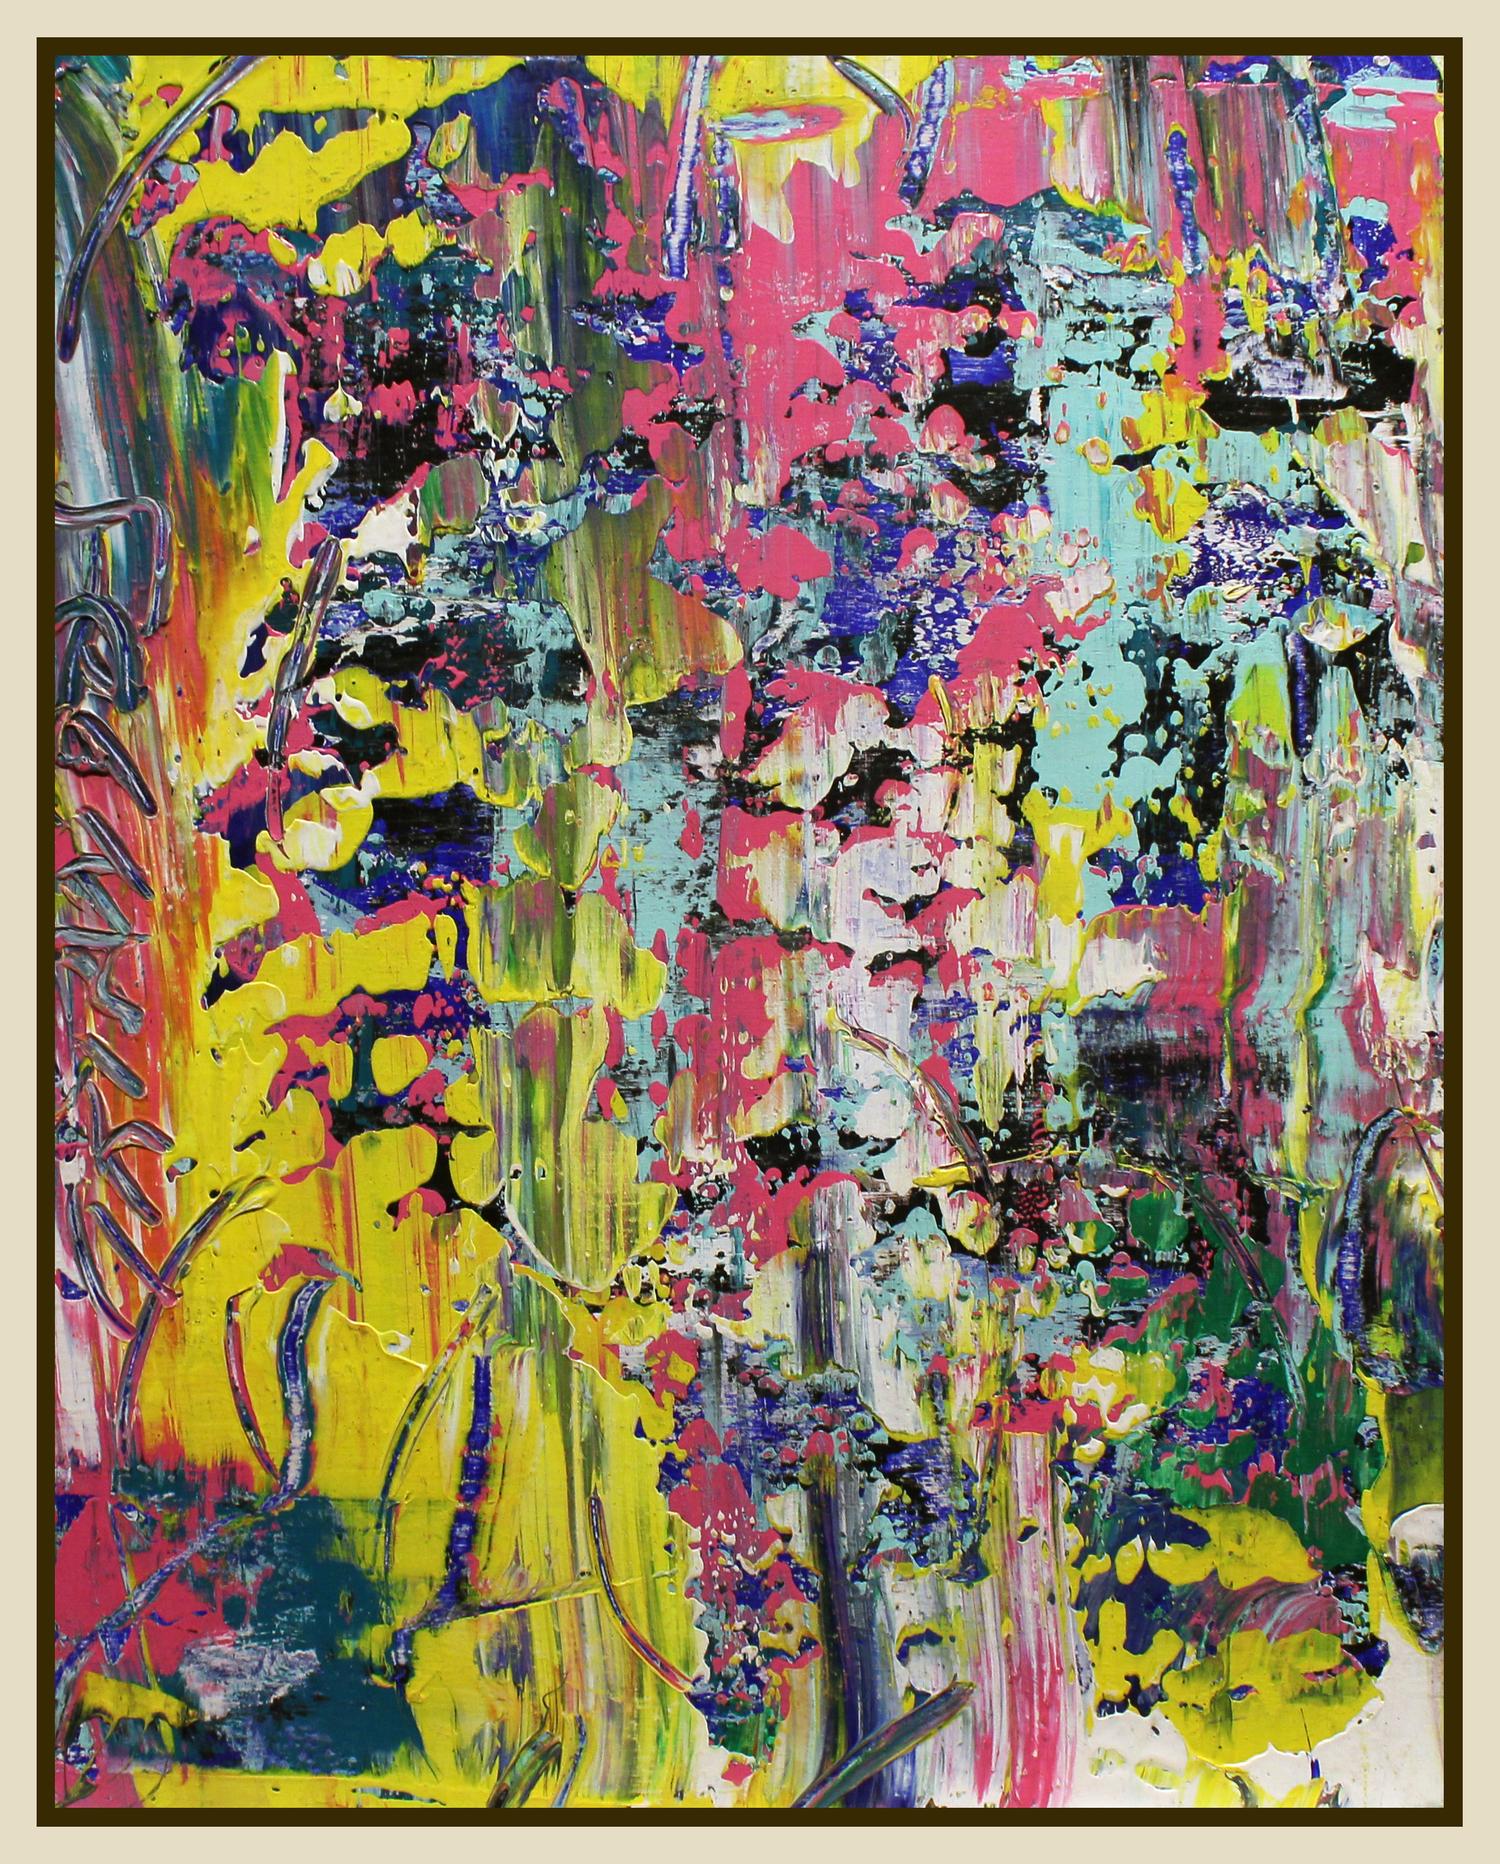 "Untitled #206, 2016, acrylic on panel, 20"" x 16"" (51 x 40.6 cm)"